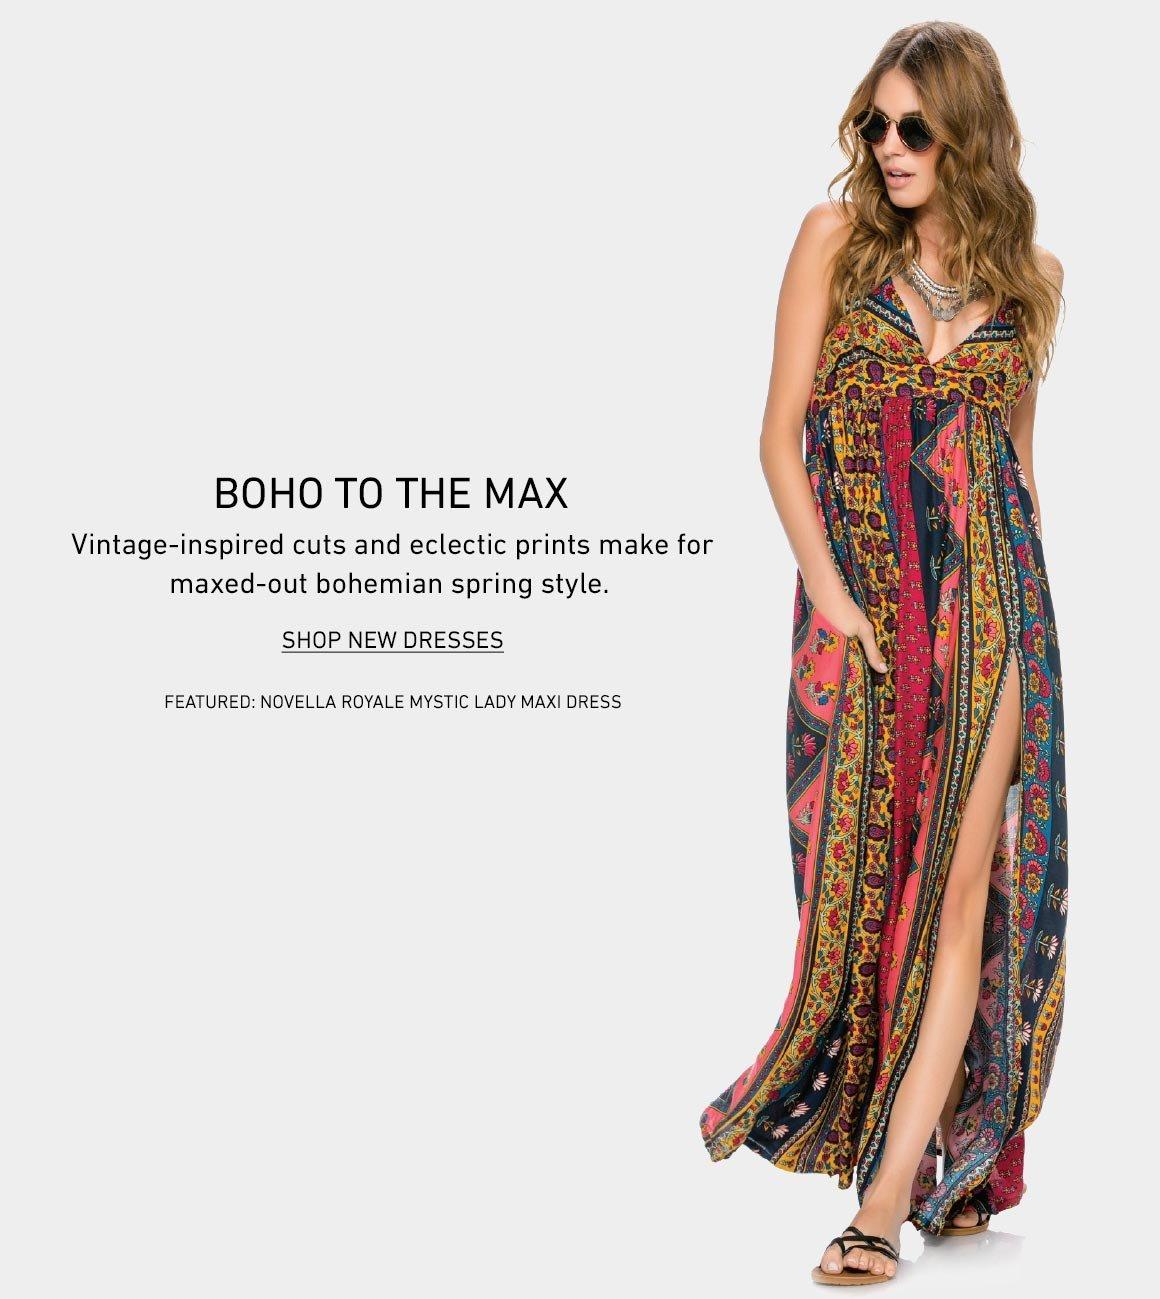 Boho To the Max: Shop New Dresses